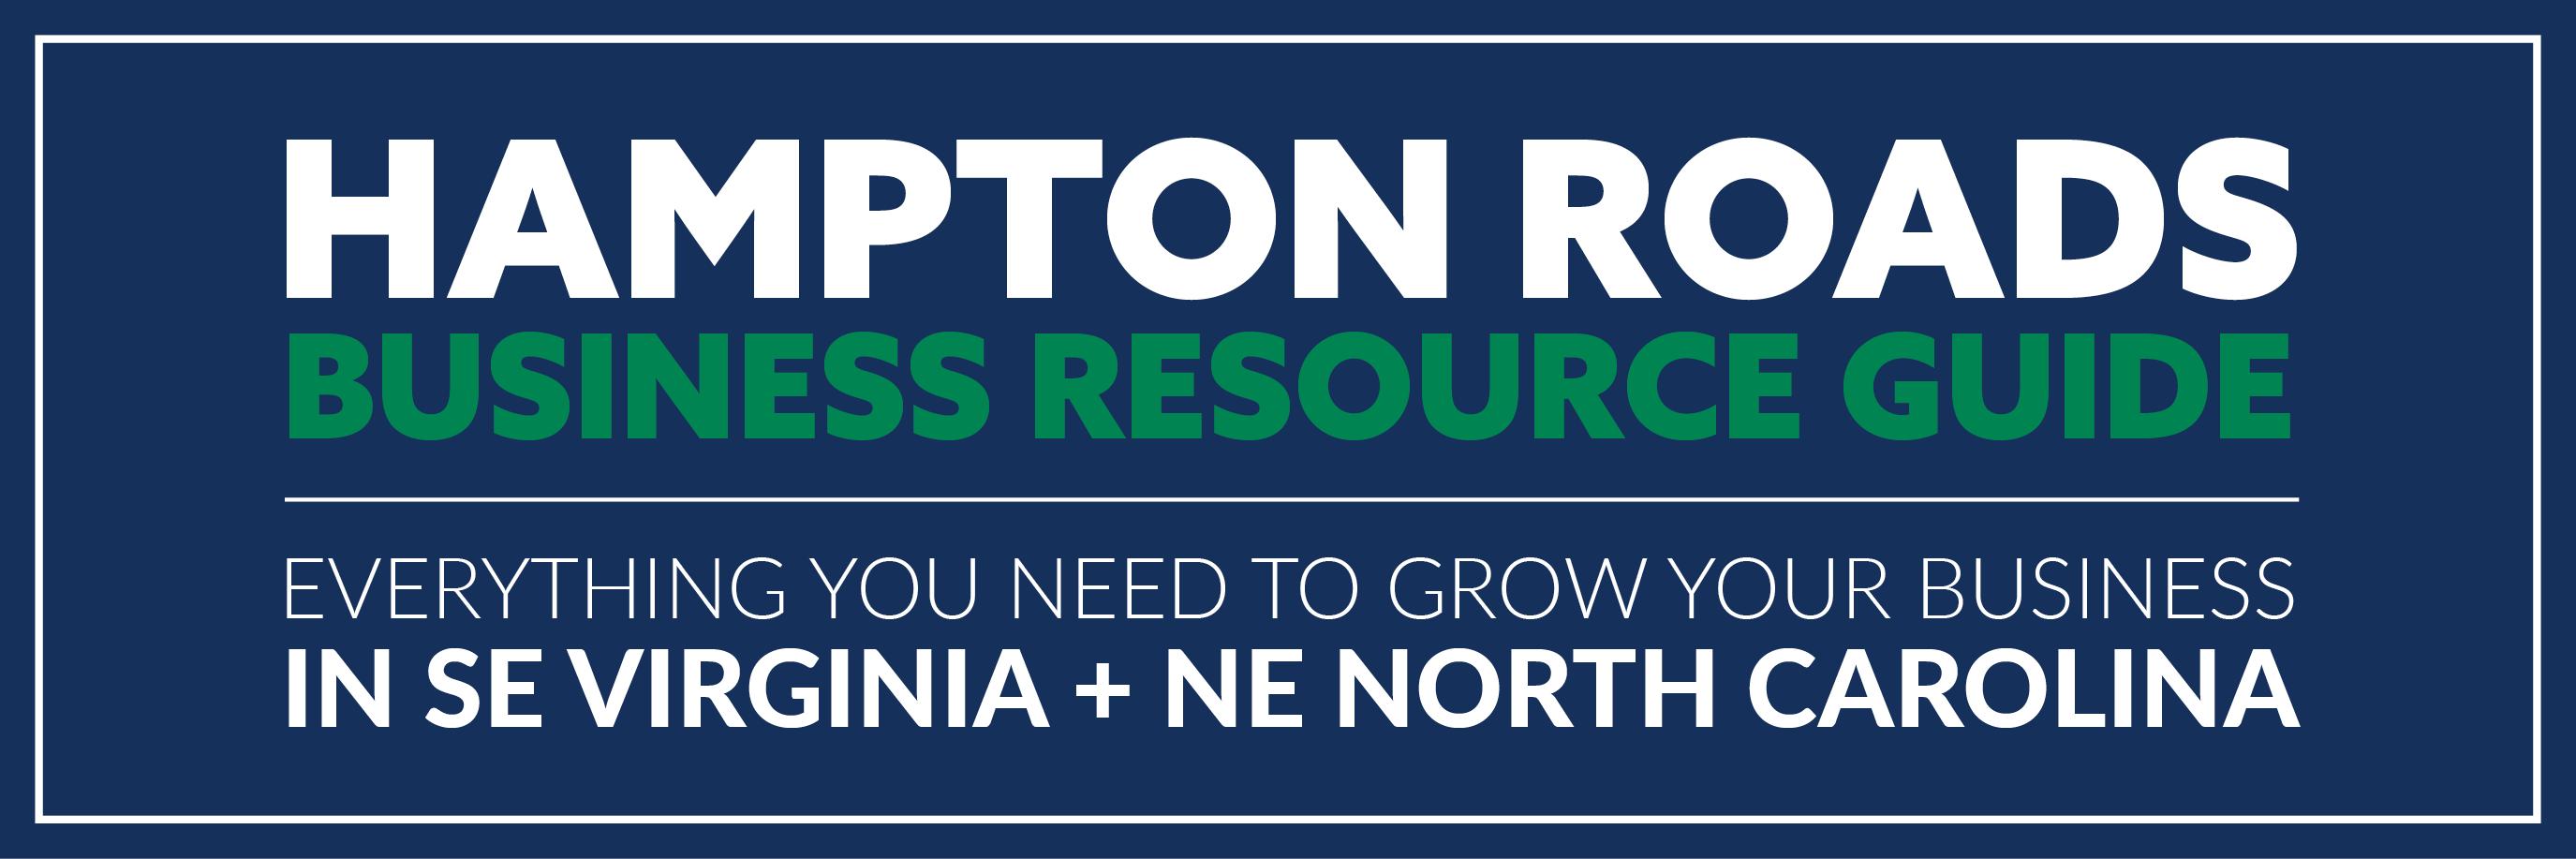 Hampton Roads Business Resource Guide